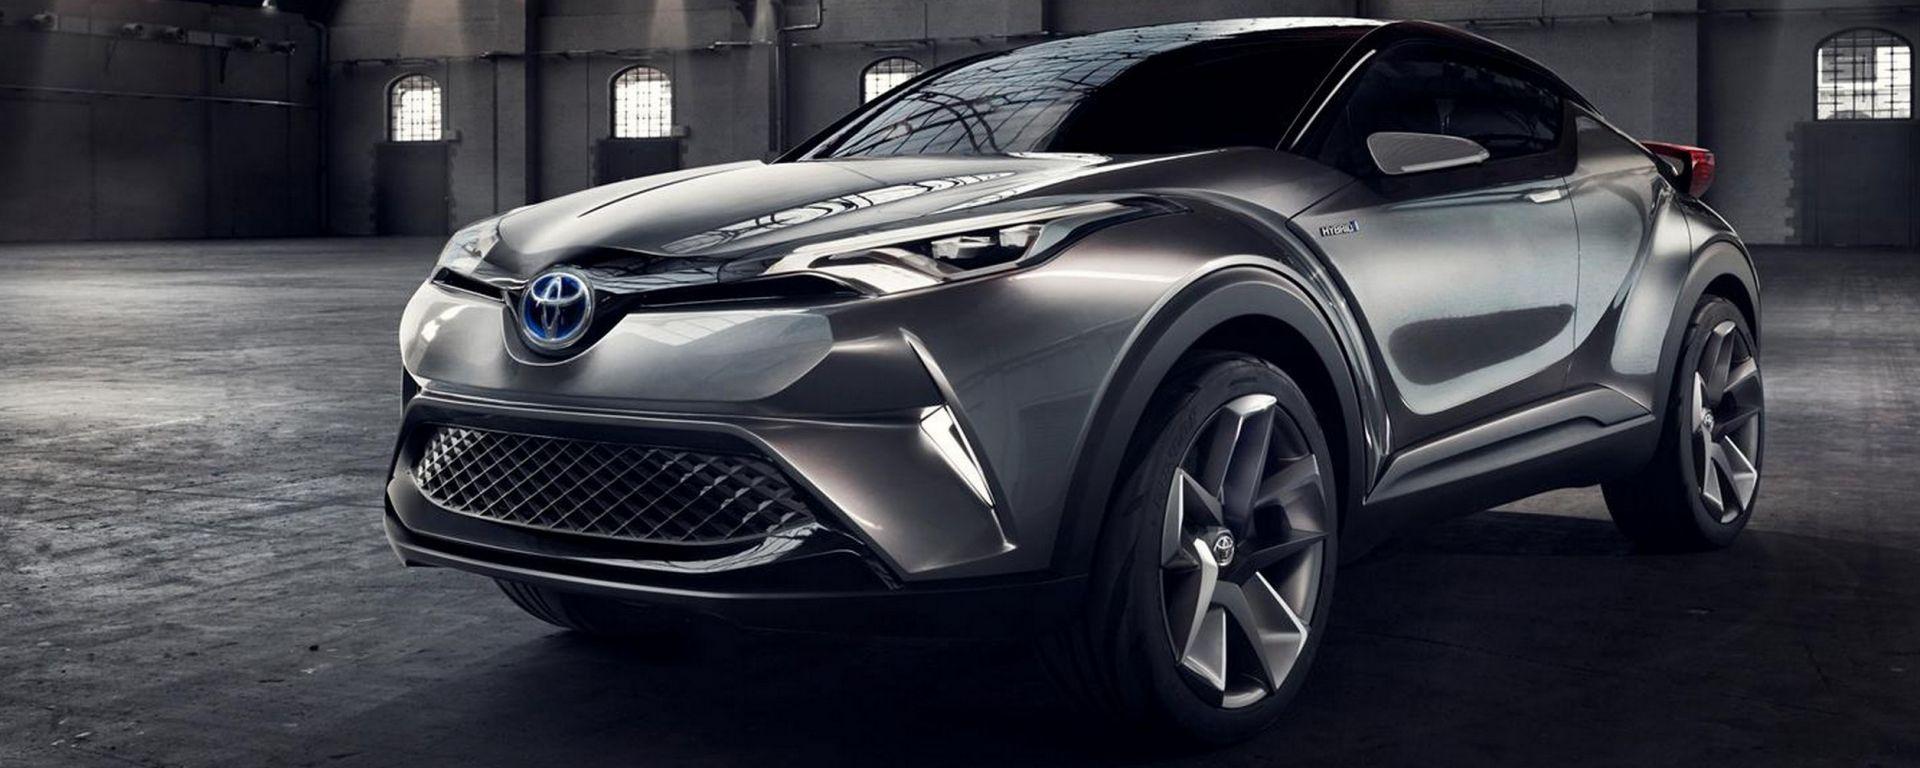 Toyota c-hr hybrid concept